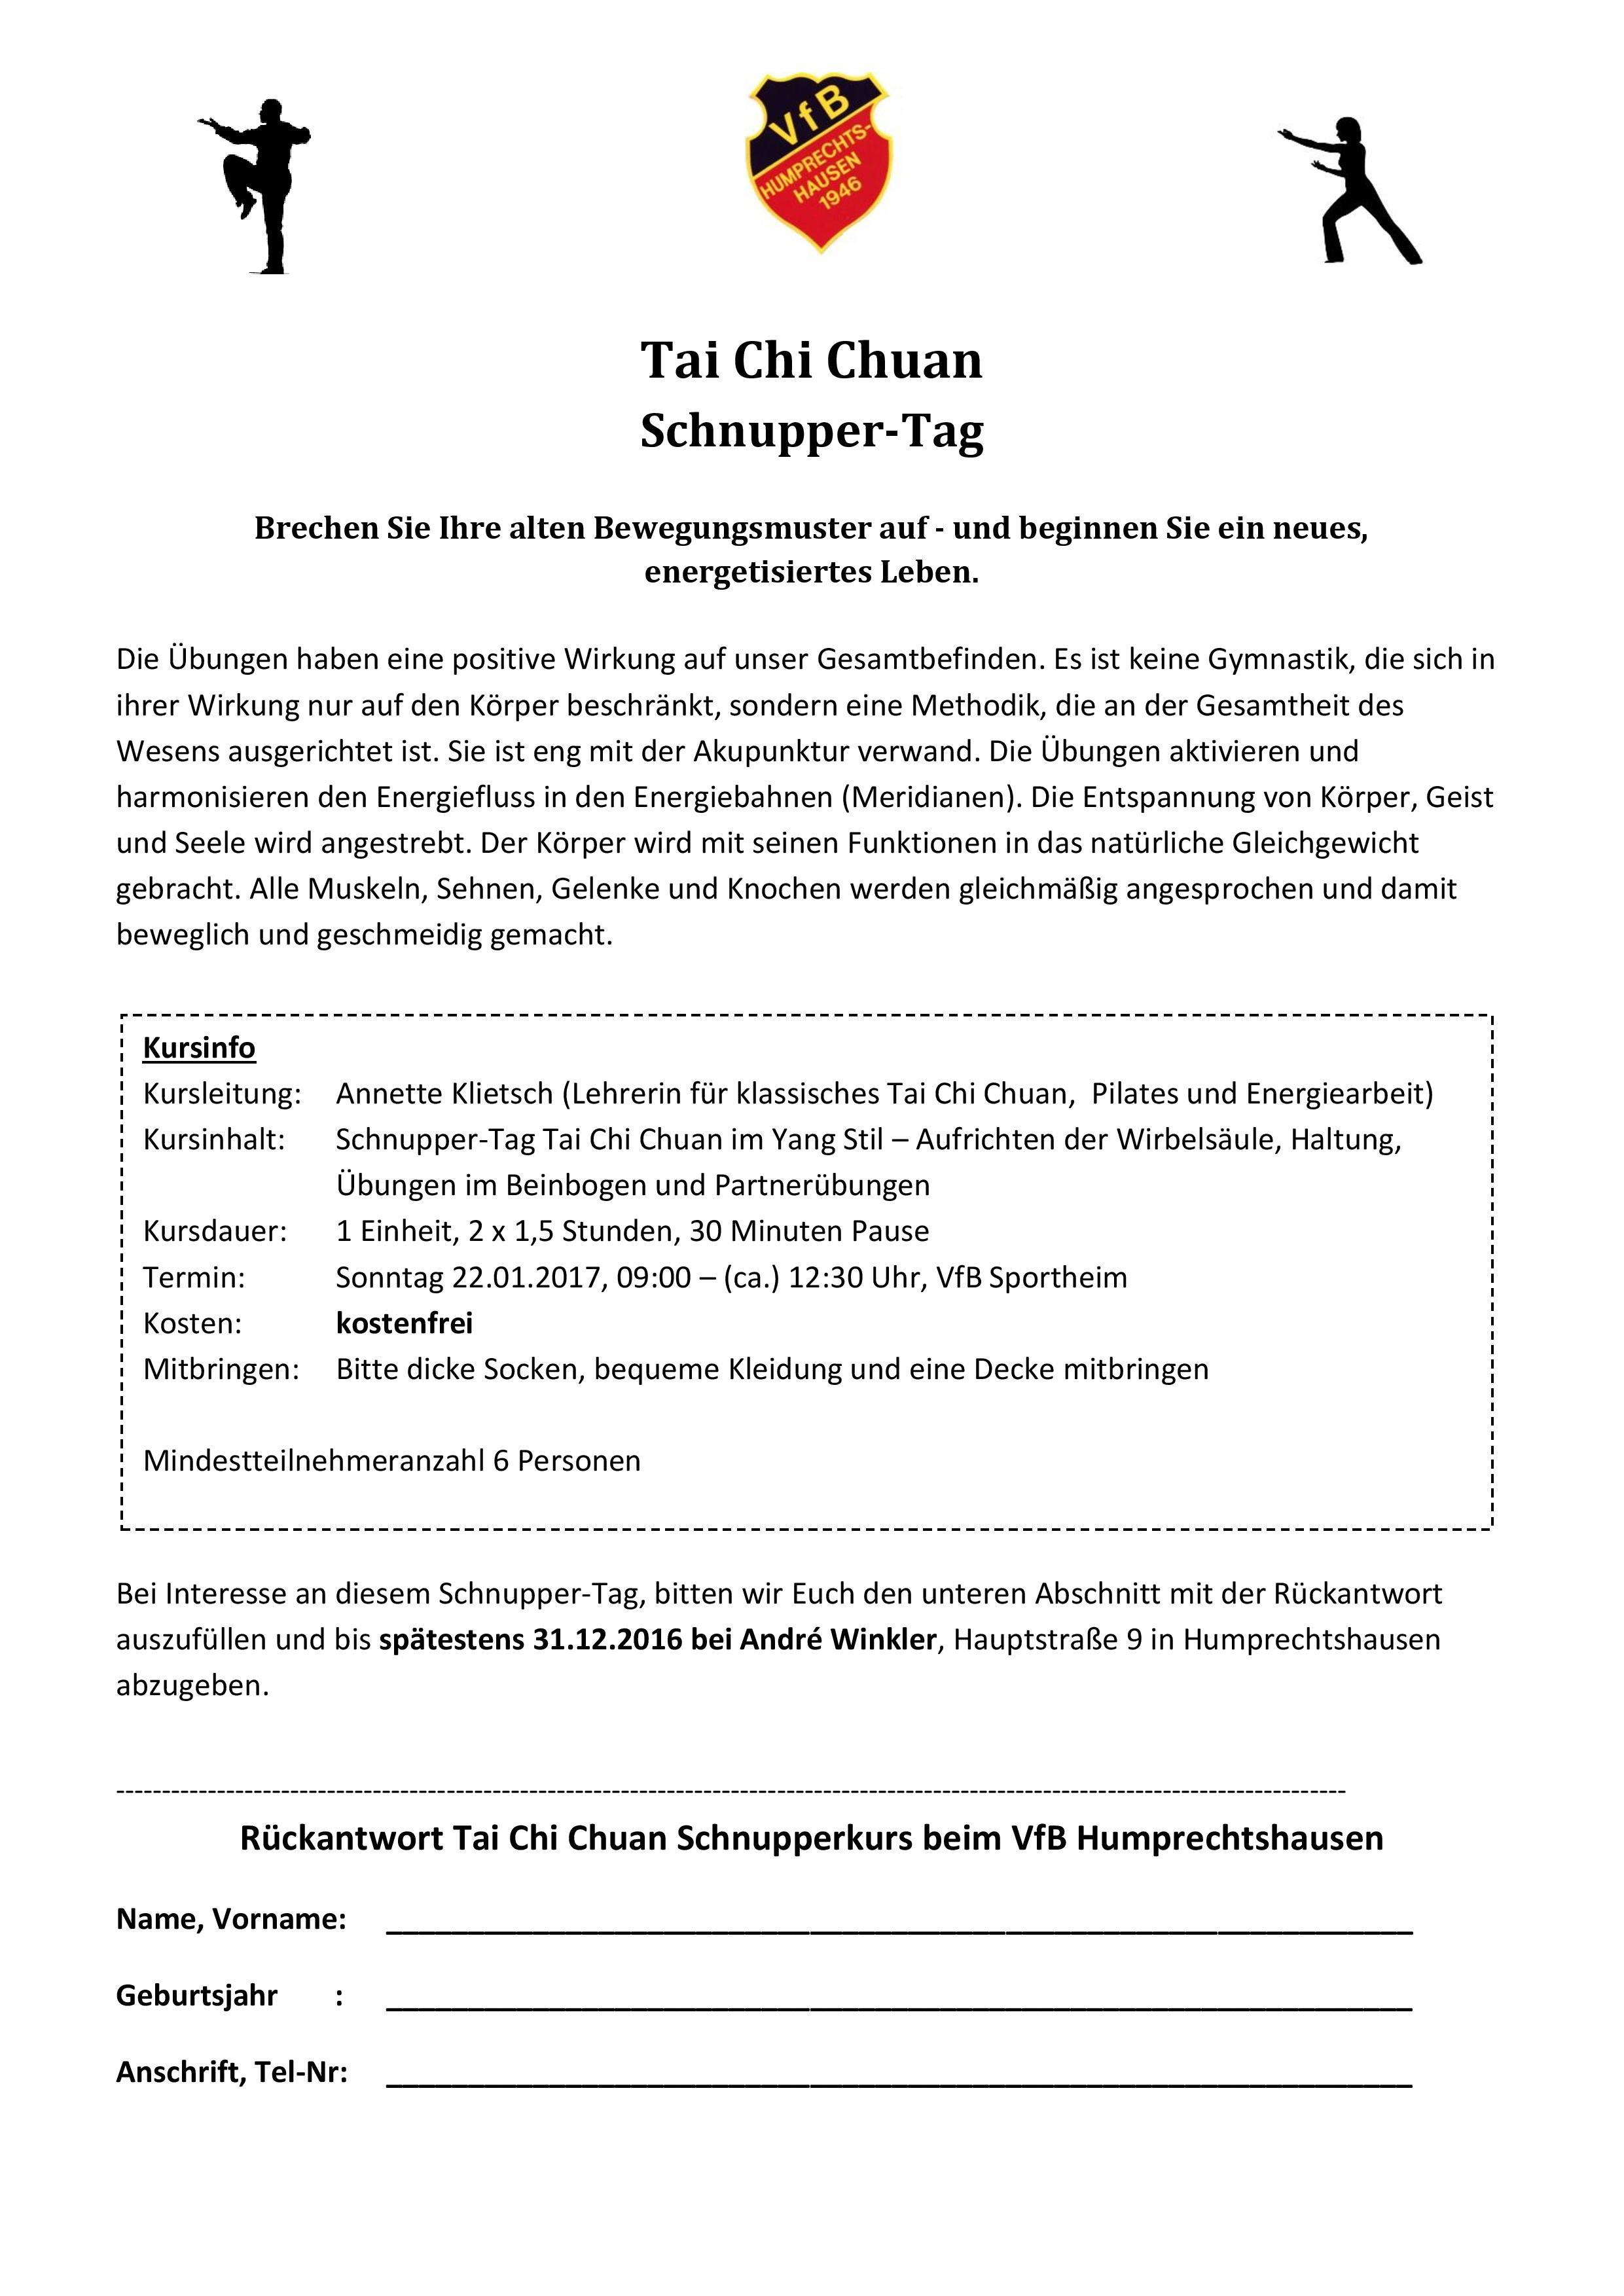 tai-chi-chuan-schnupperkurs